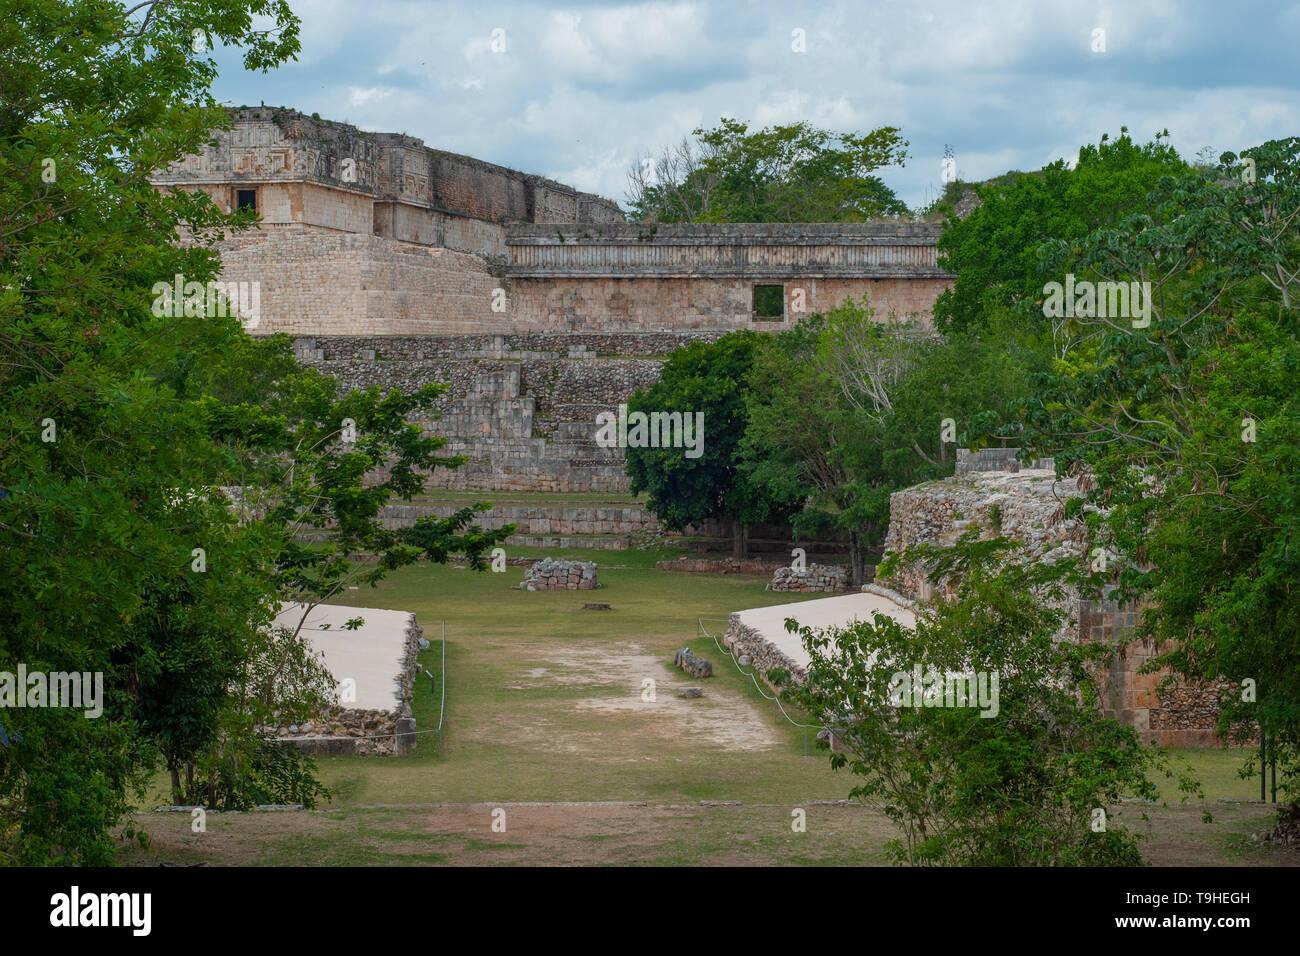 View of the Mayan archaeological area of Ek Balam, on the Yucatan peninsula - Stock Image